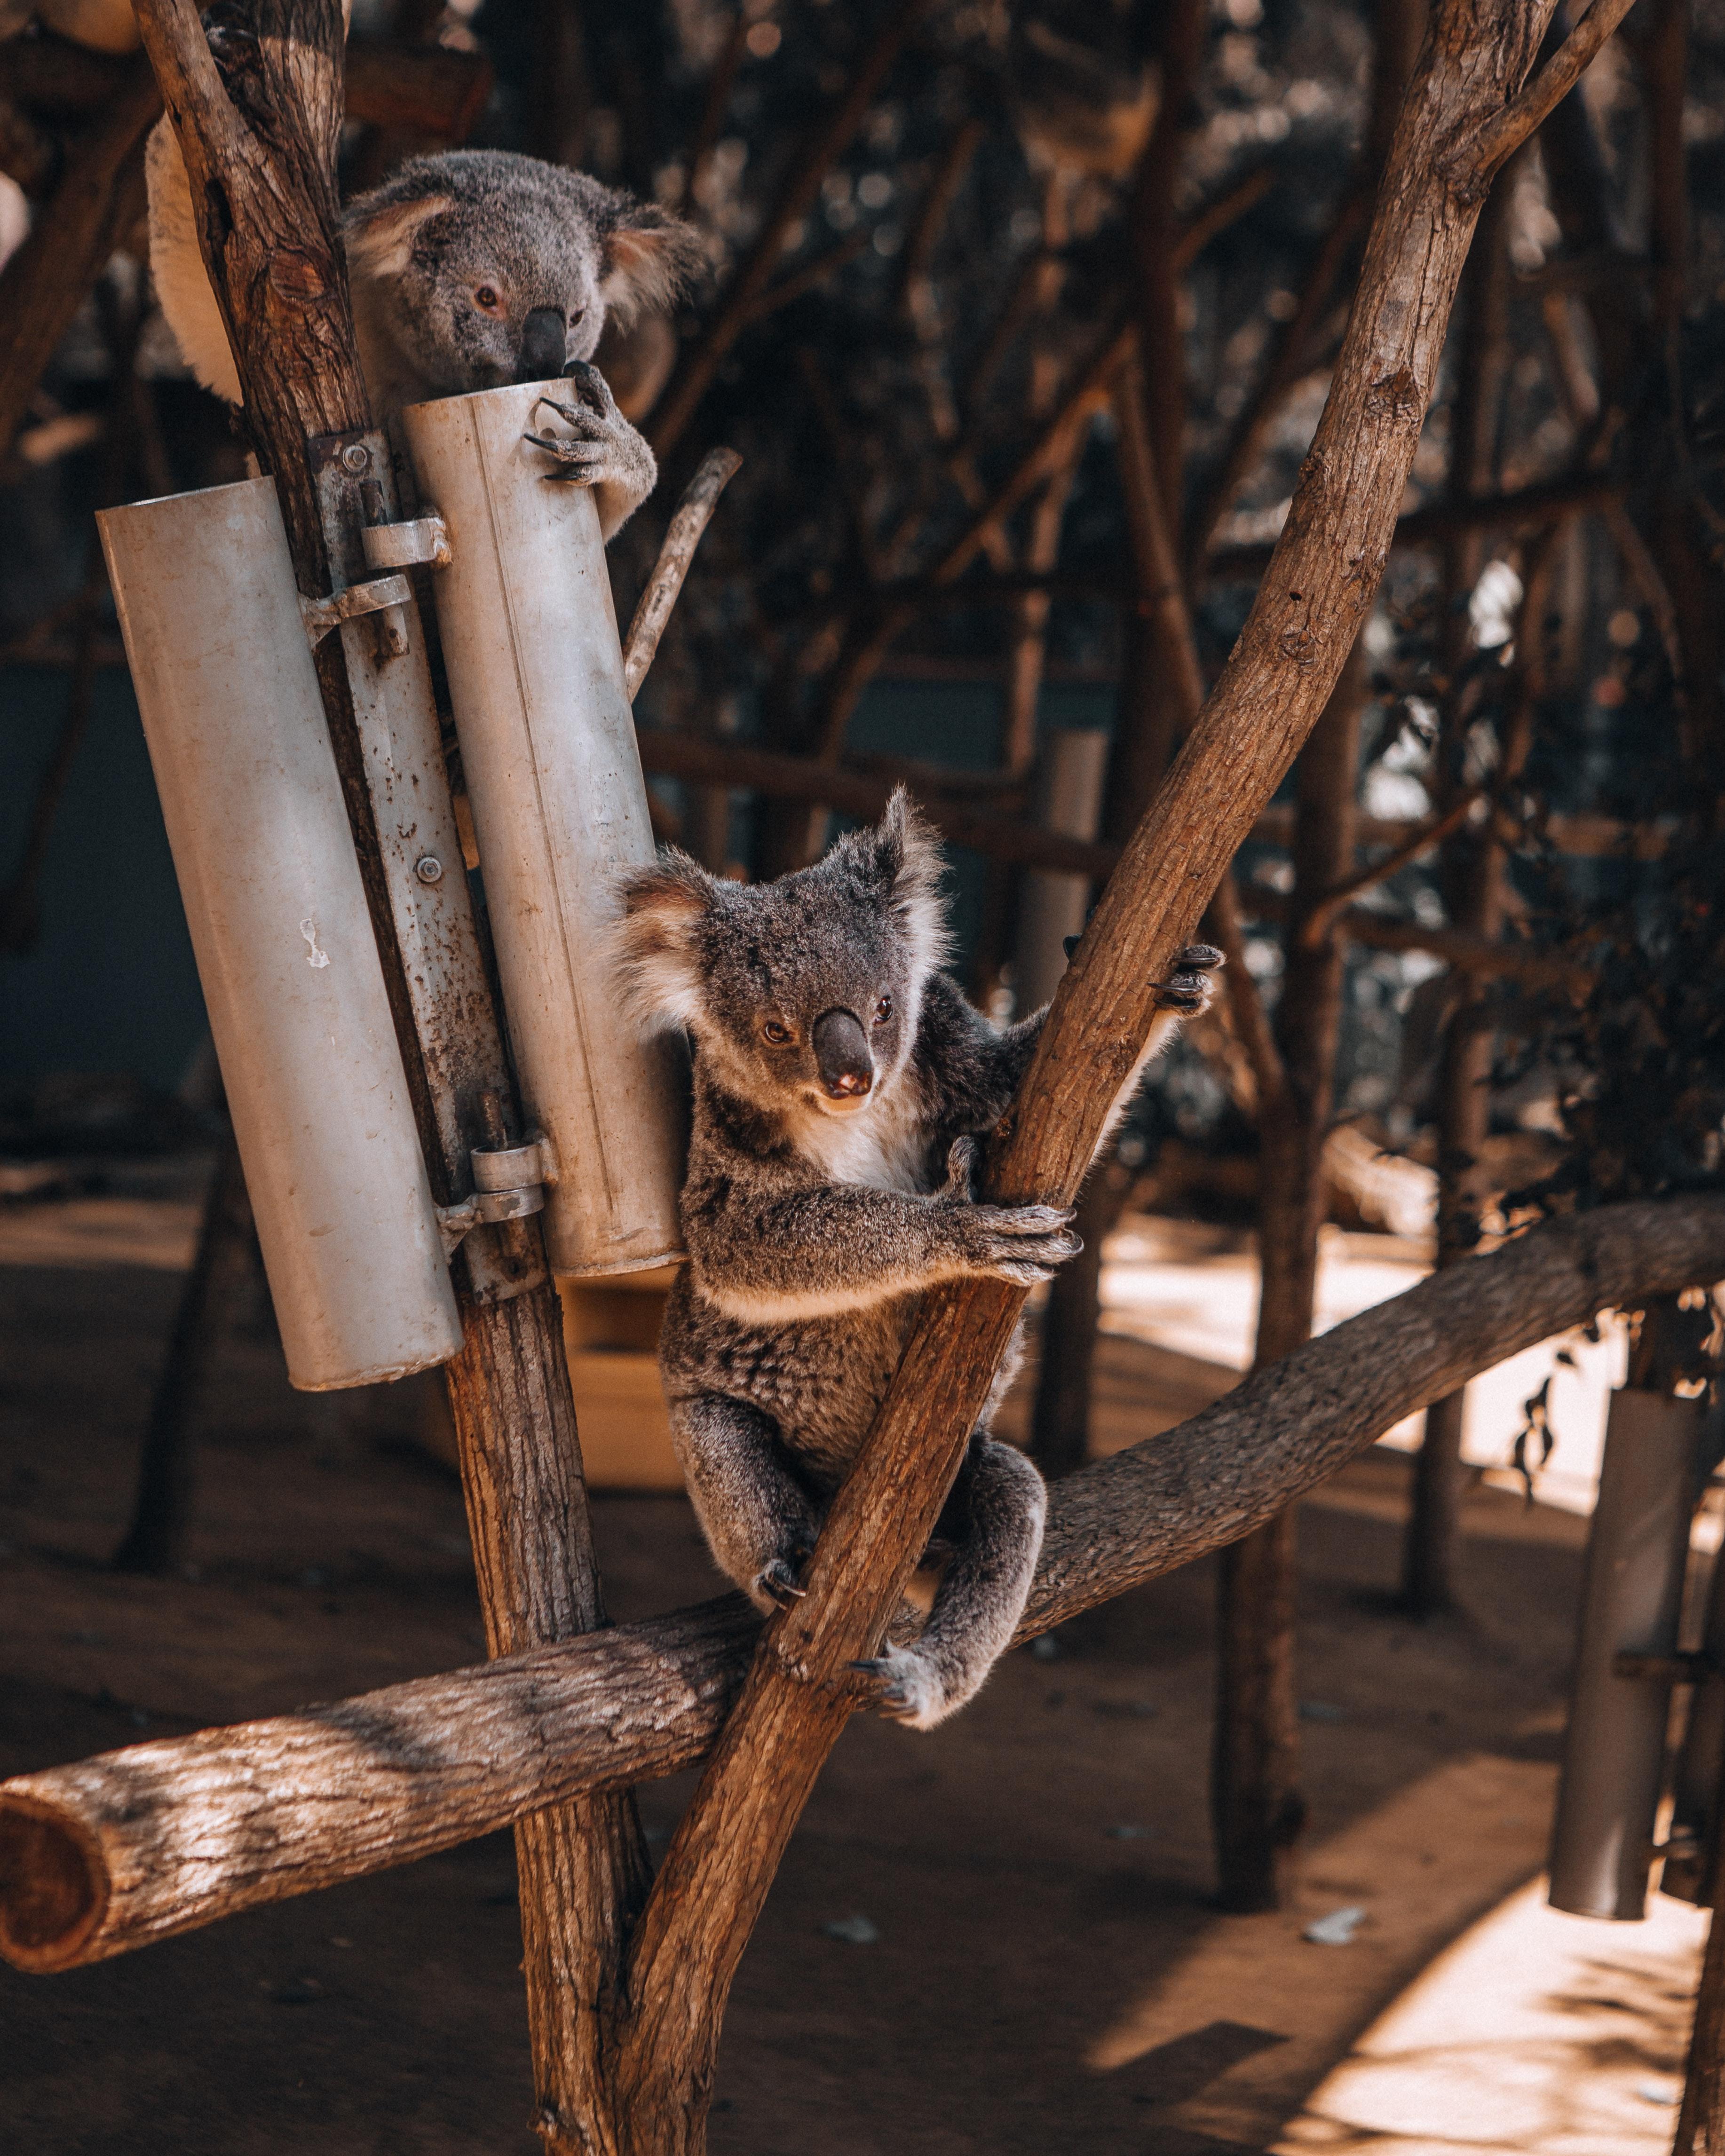 66088 download wallpaper Animals, Koalas, Wood, Tree, Animal, Koala screensavers and pictures for free